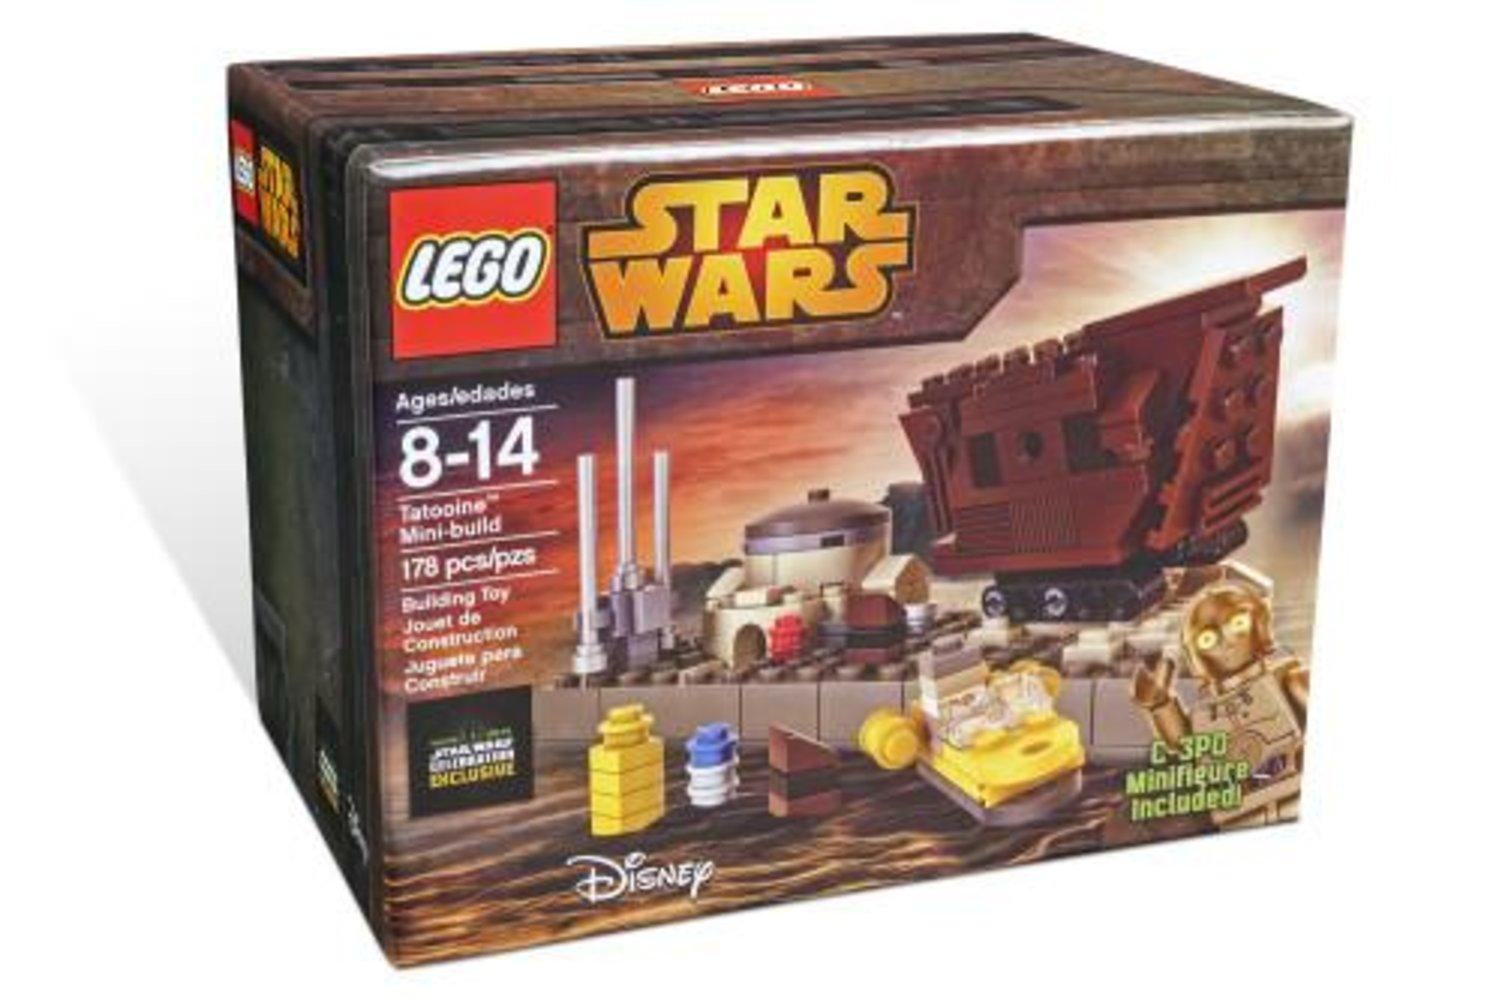 Tatooine Mini-build - Star Wars Celebration Exclusive